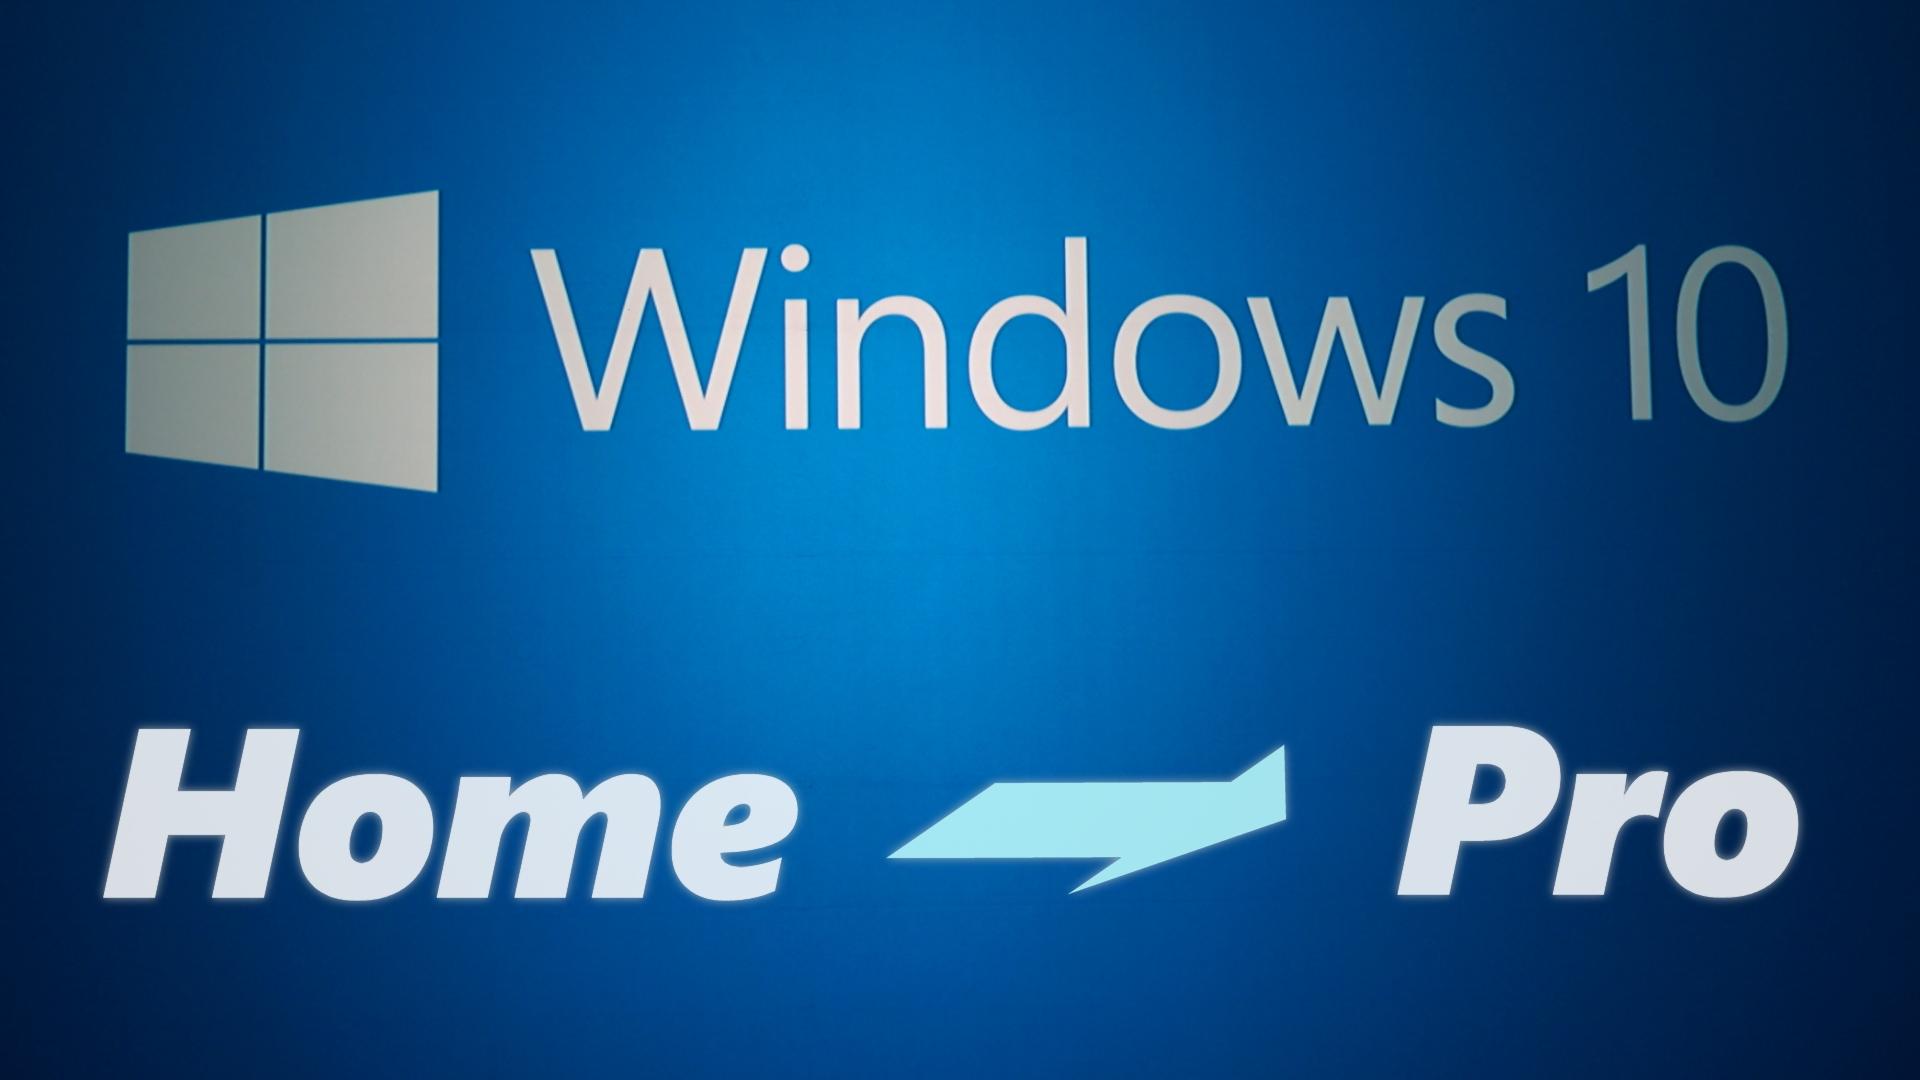 Win Pro Windows Clay : Actualizar de windows home a pro